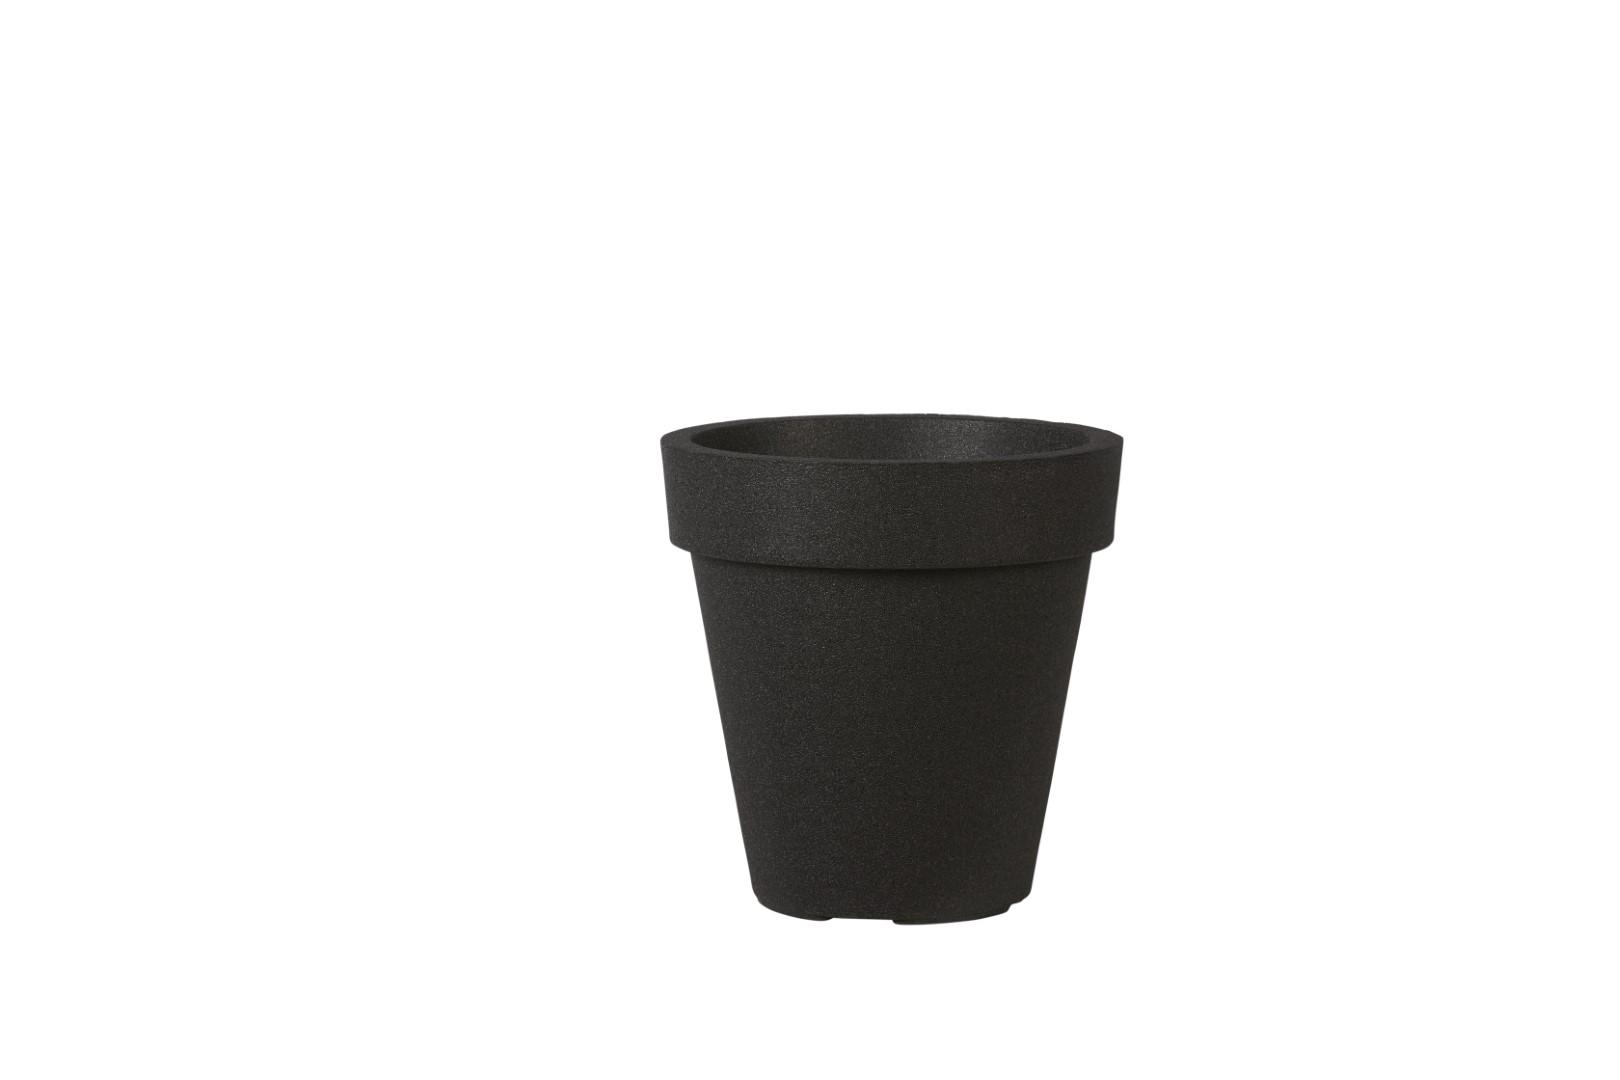 Iqbana pot milano round black